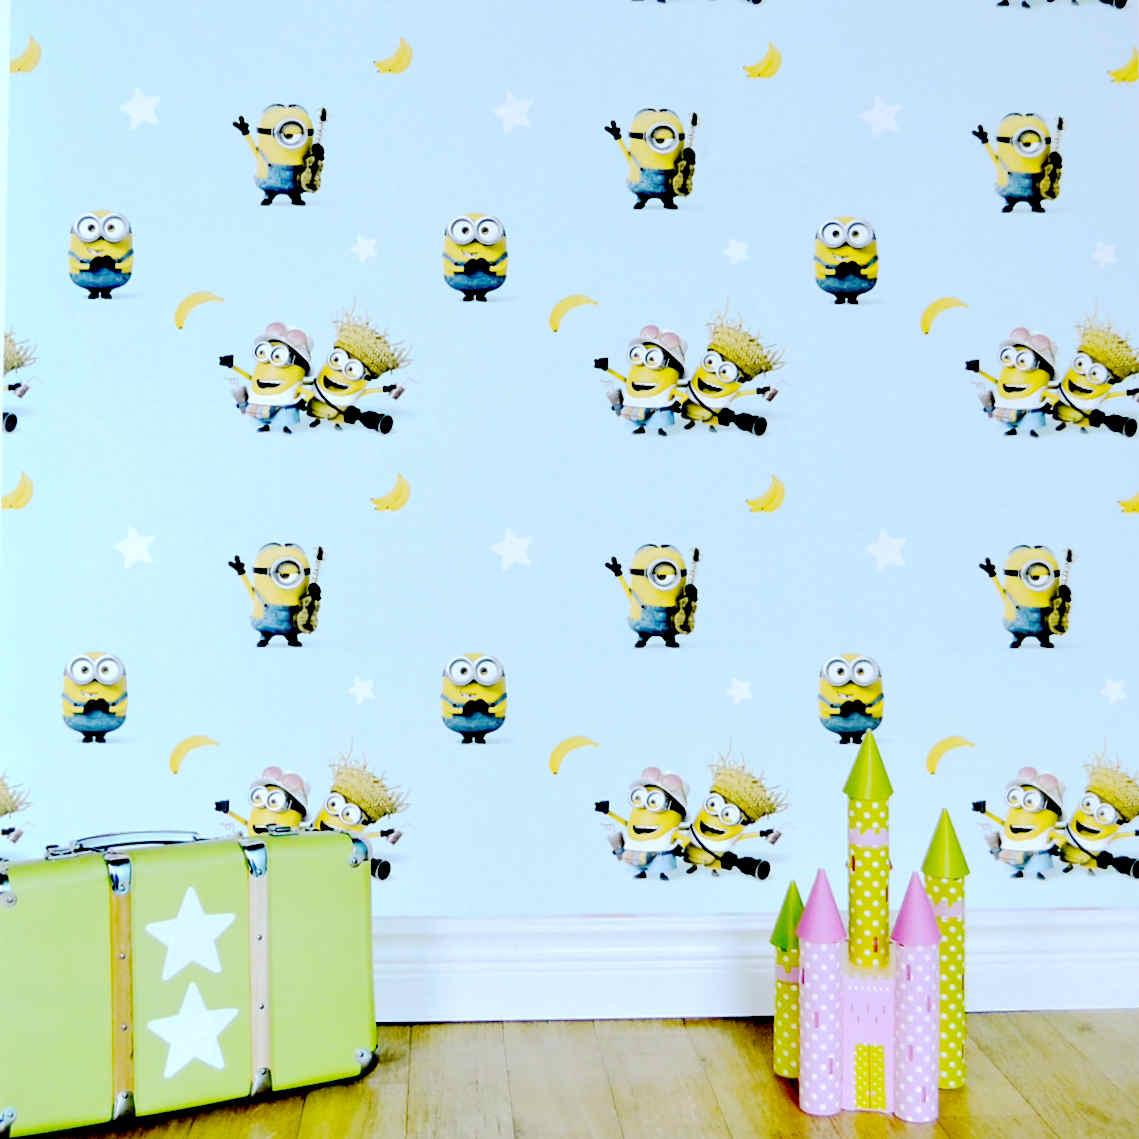 Stiker Dinding Kamar Minions - HD Wallpaper